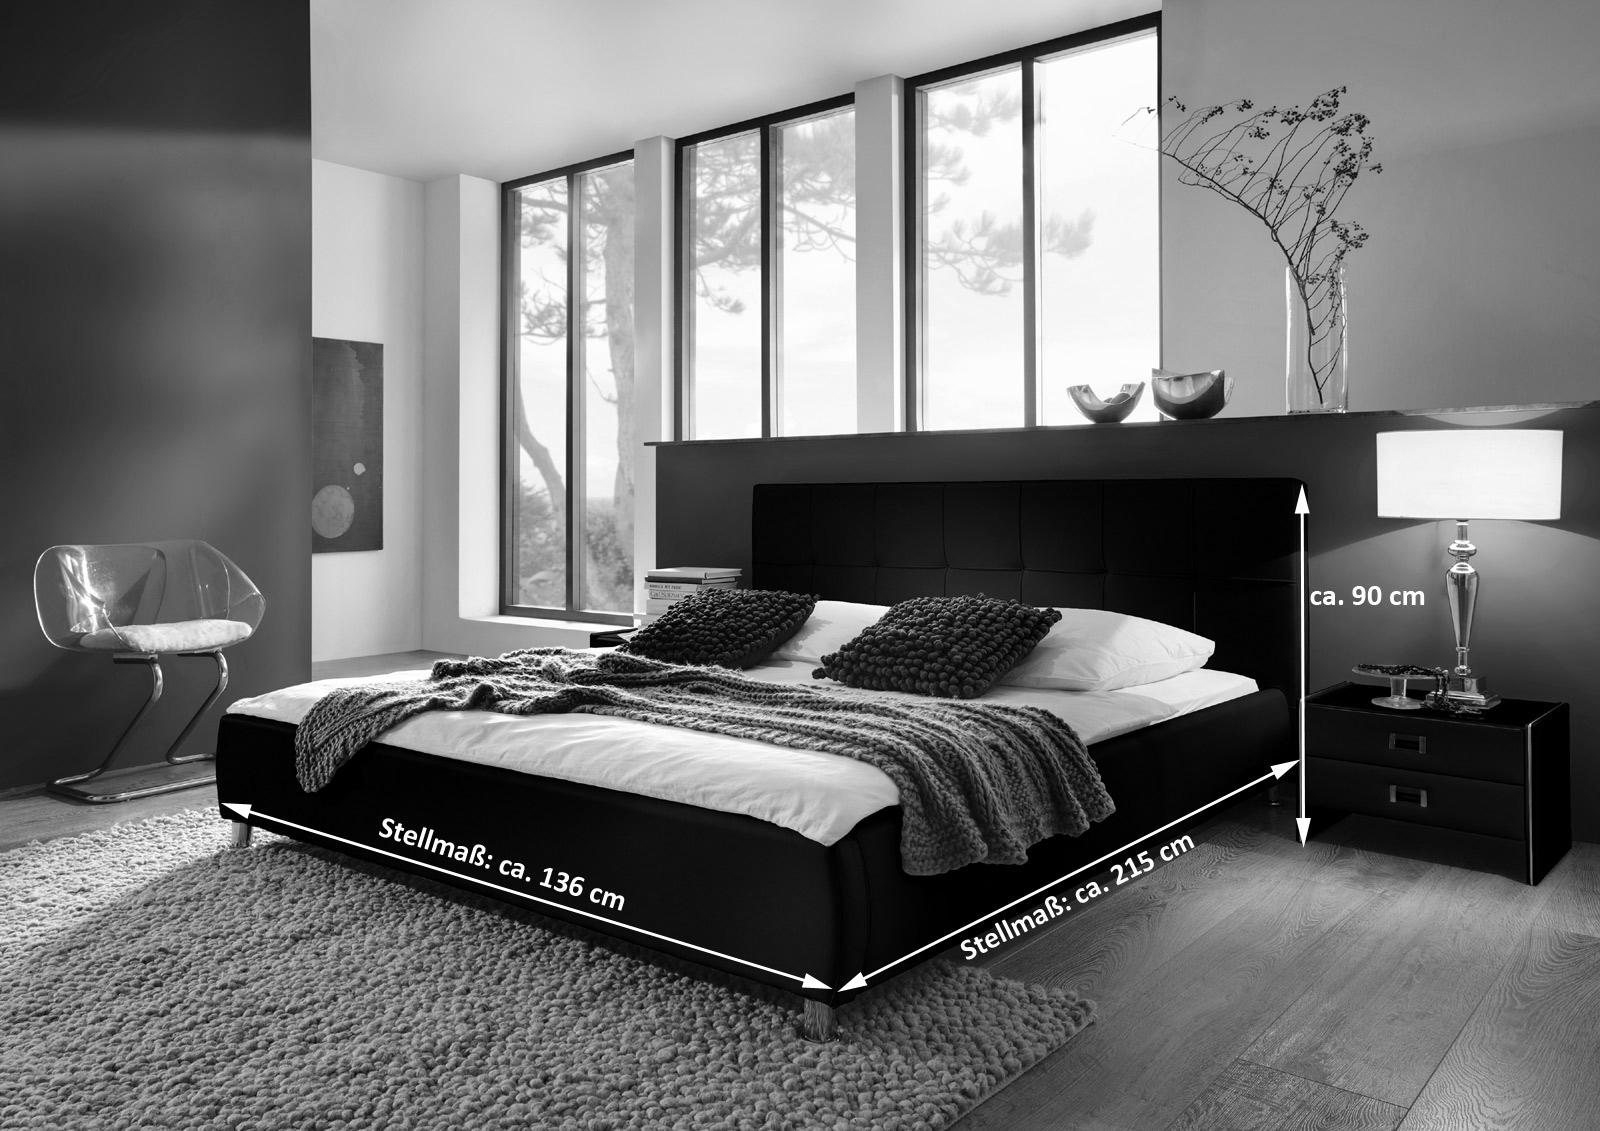 sam polsterbett 120x200 cm schwarz bettgestell g nstig zarah. Black Bedroom Furniture Sets. Home Design Ideas